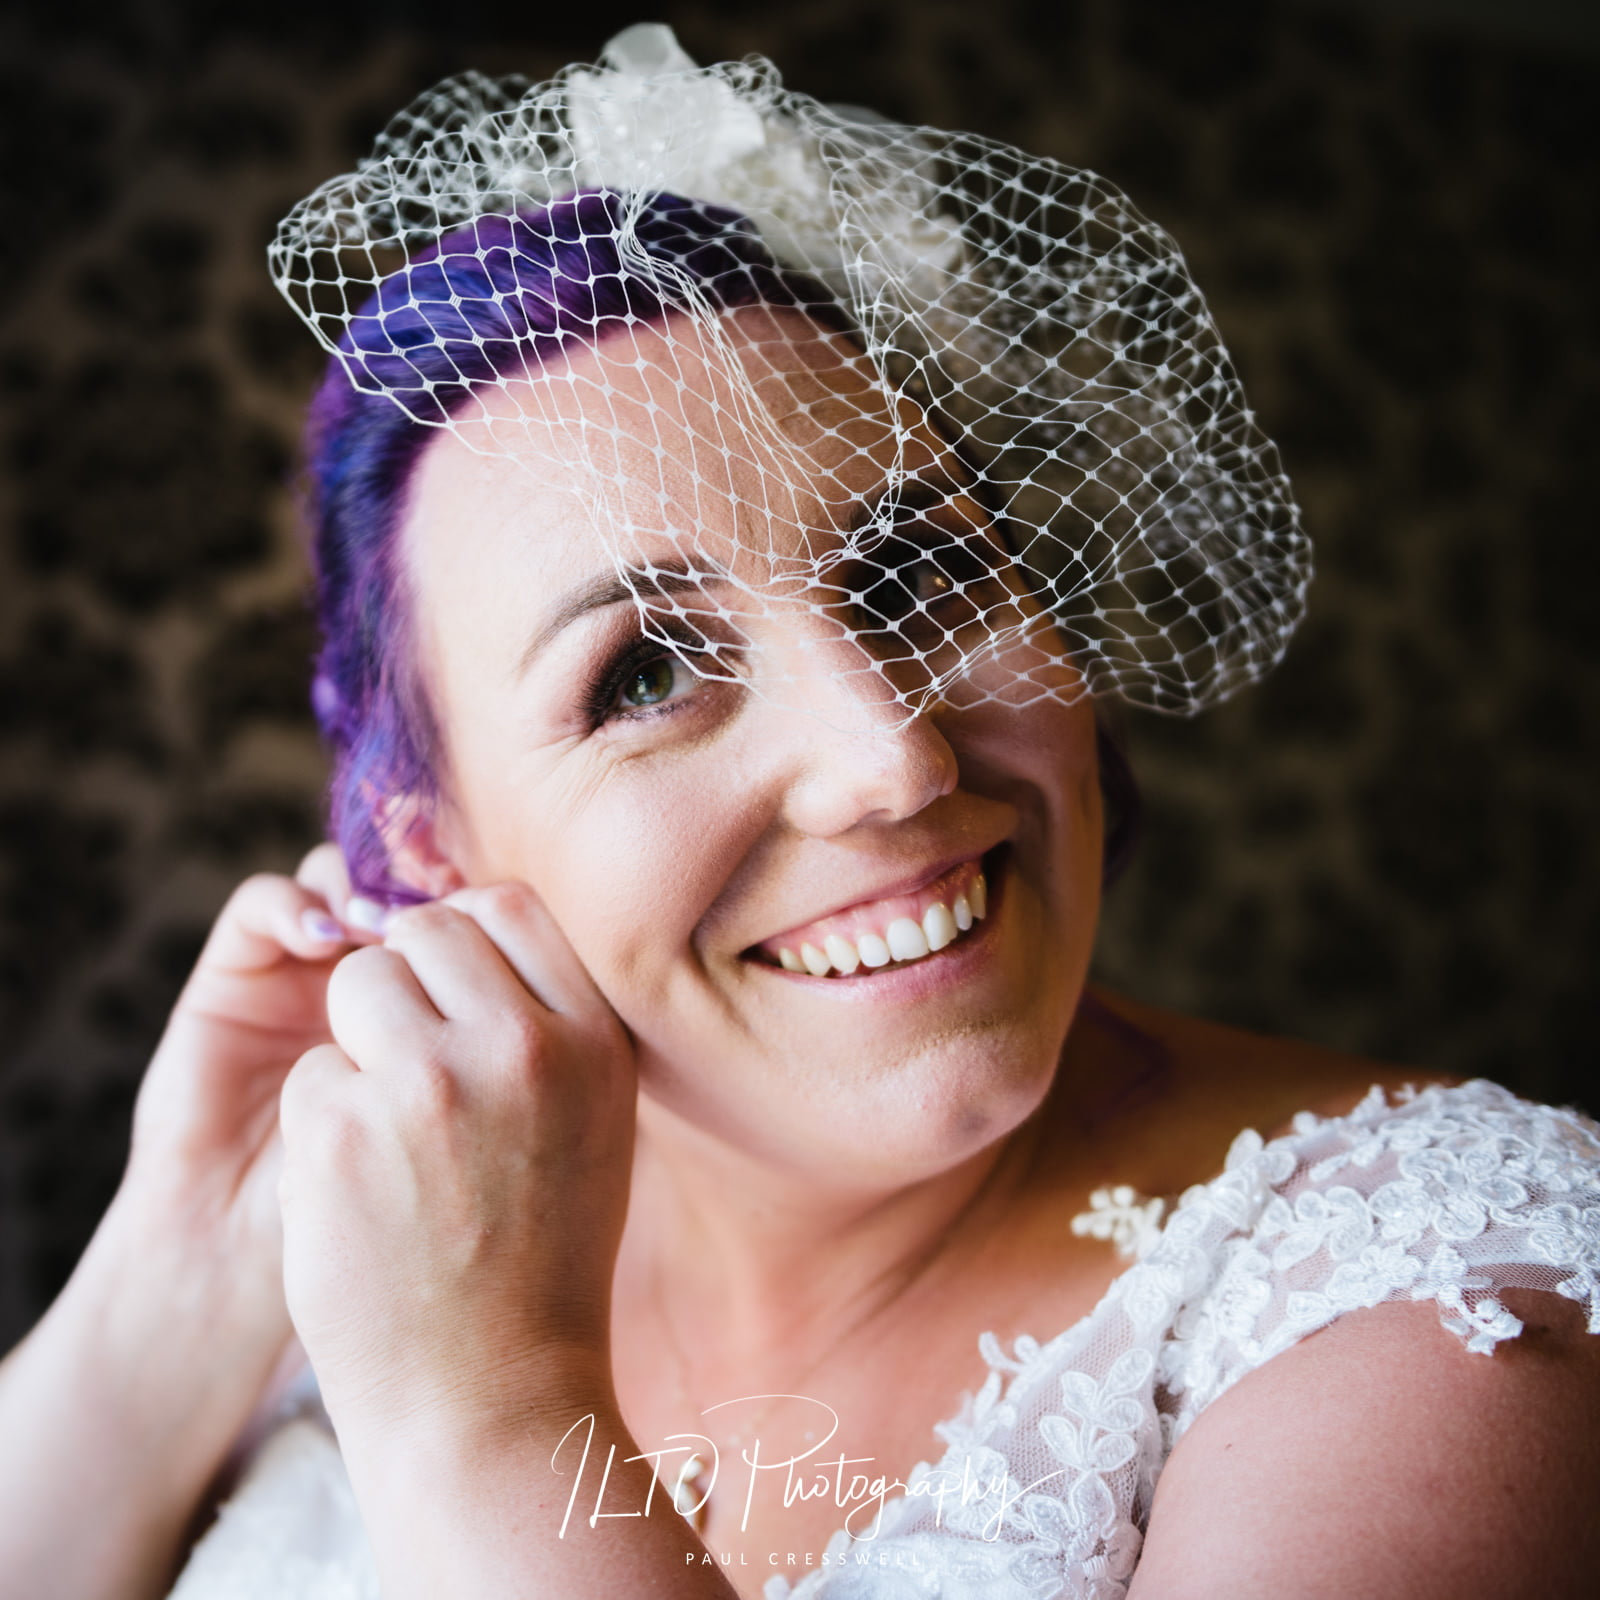 creative wedding photographer, purple hair bride